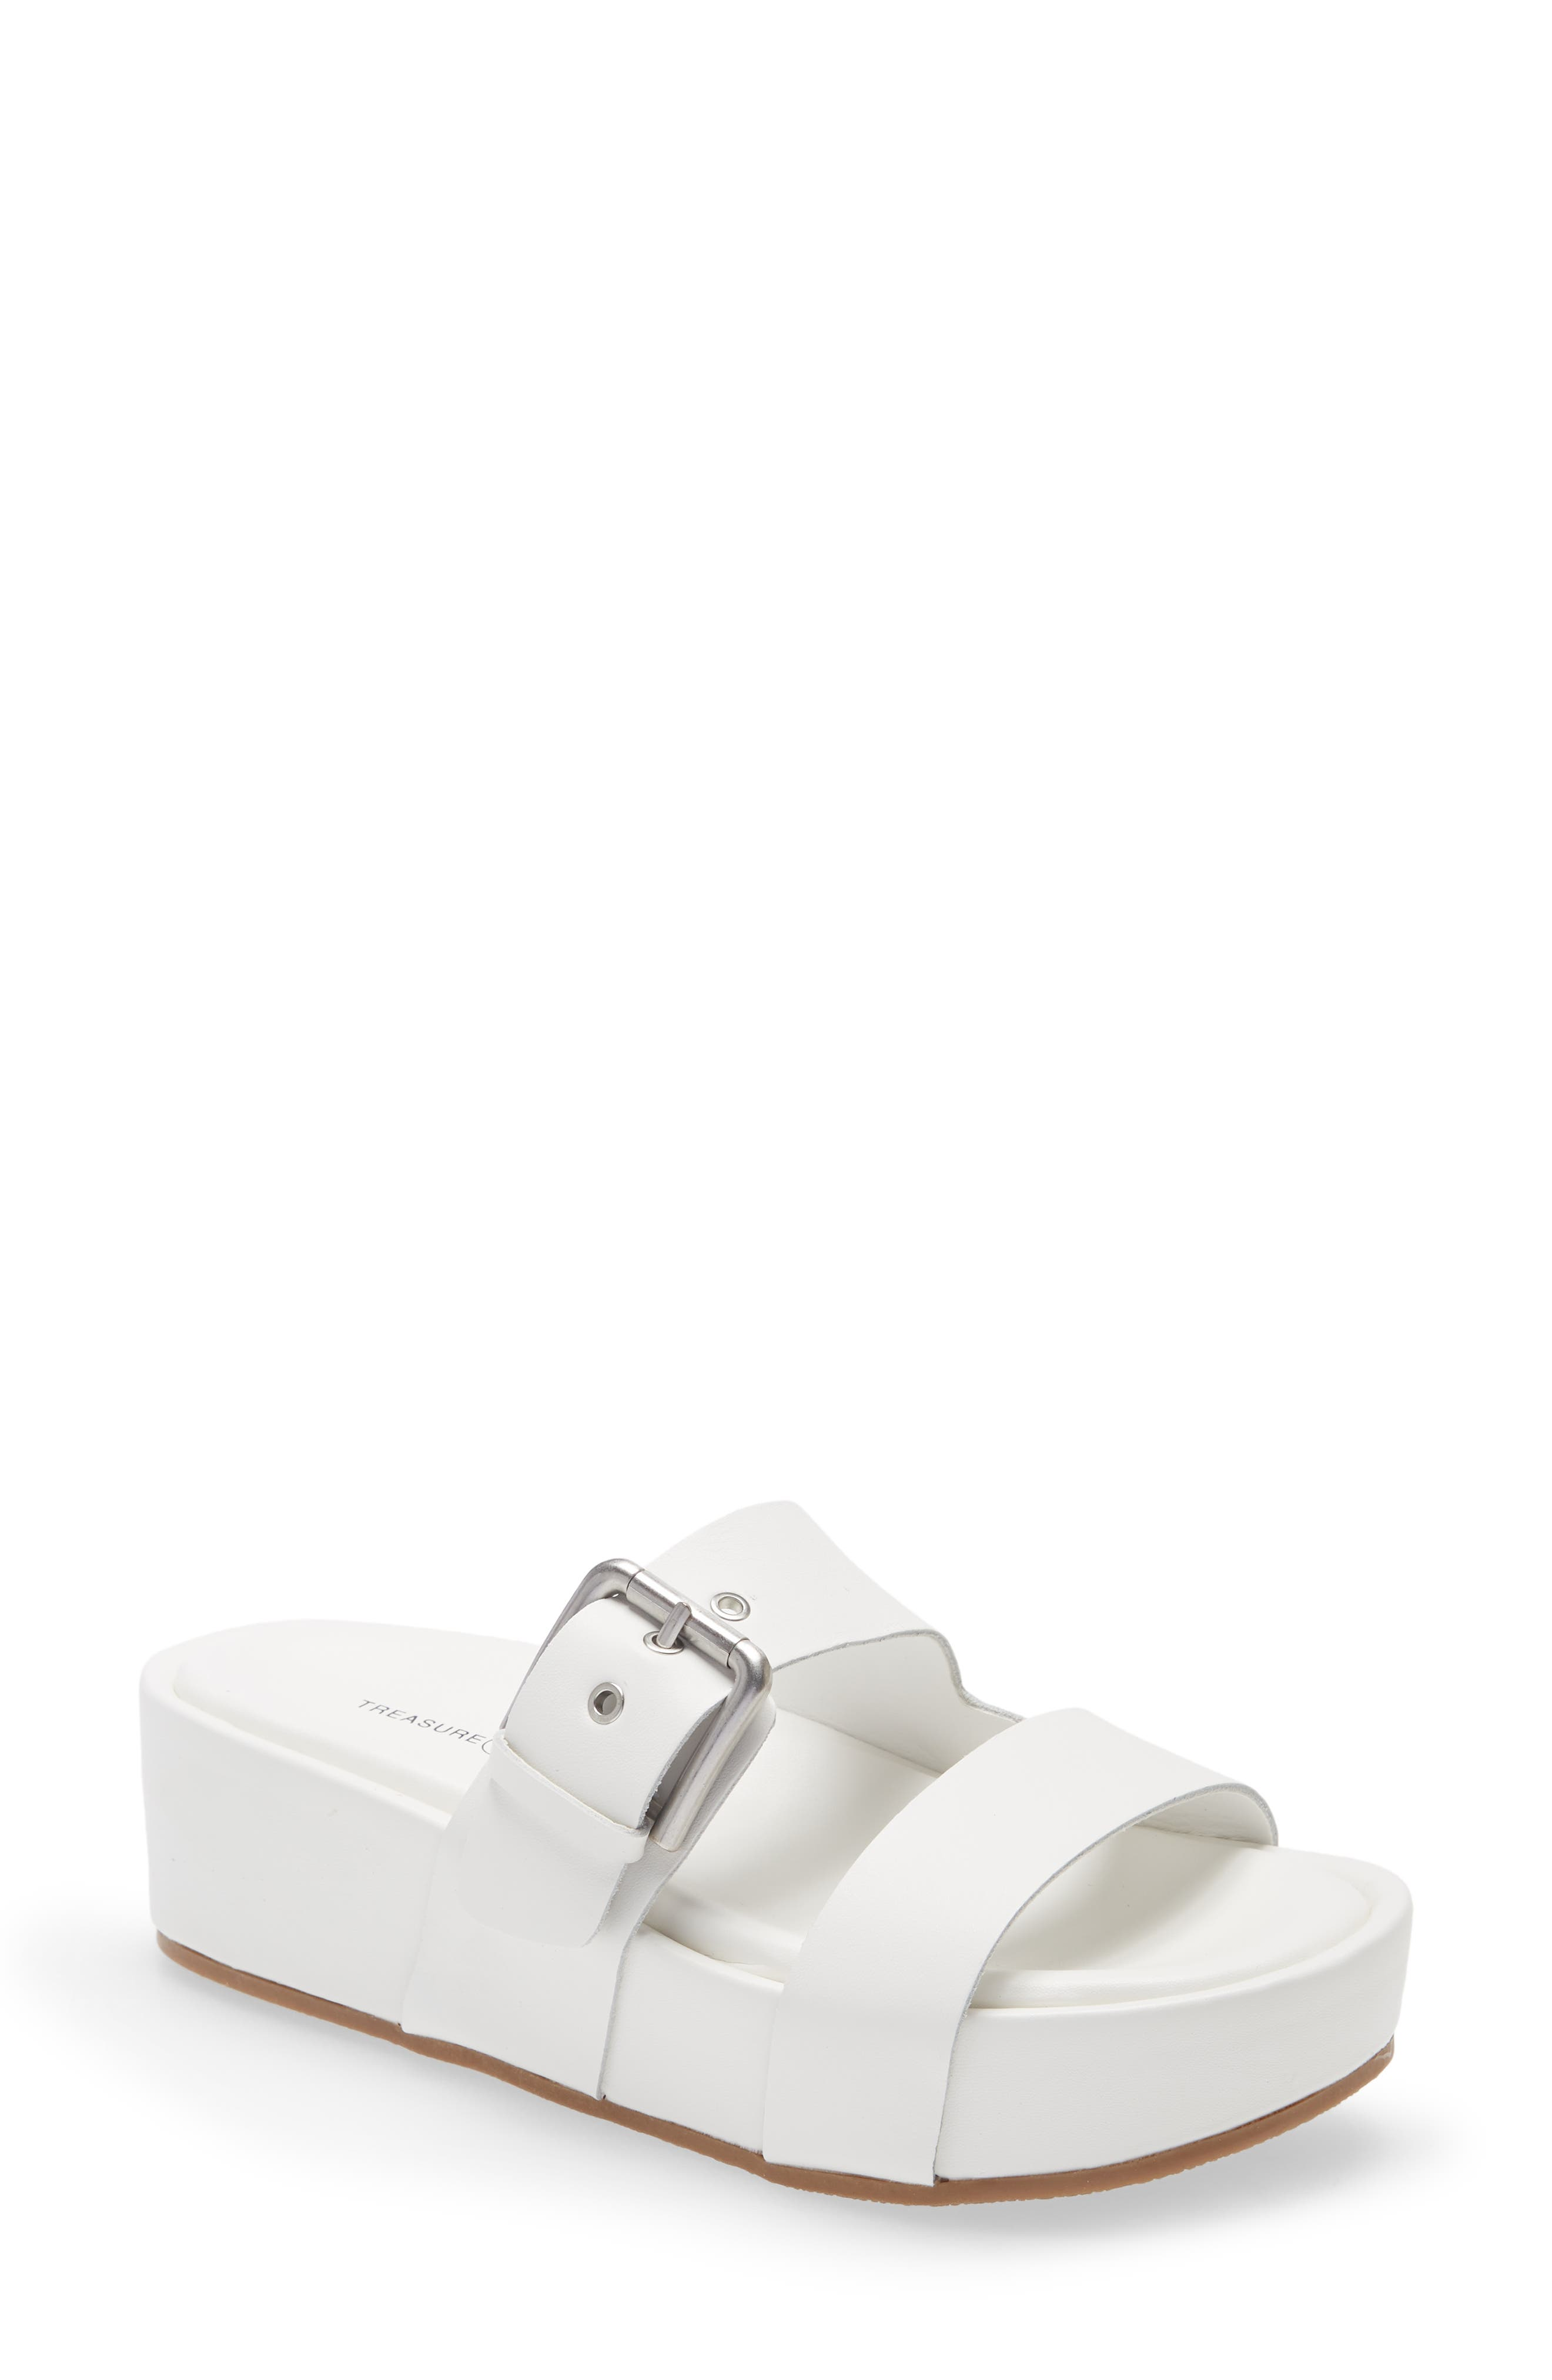 Fly Shoes Slides Black Monochrome Slip Ons Comfy Size 39 Or 8.5 9